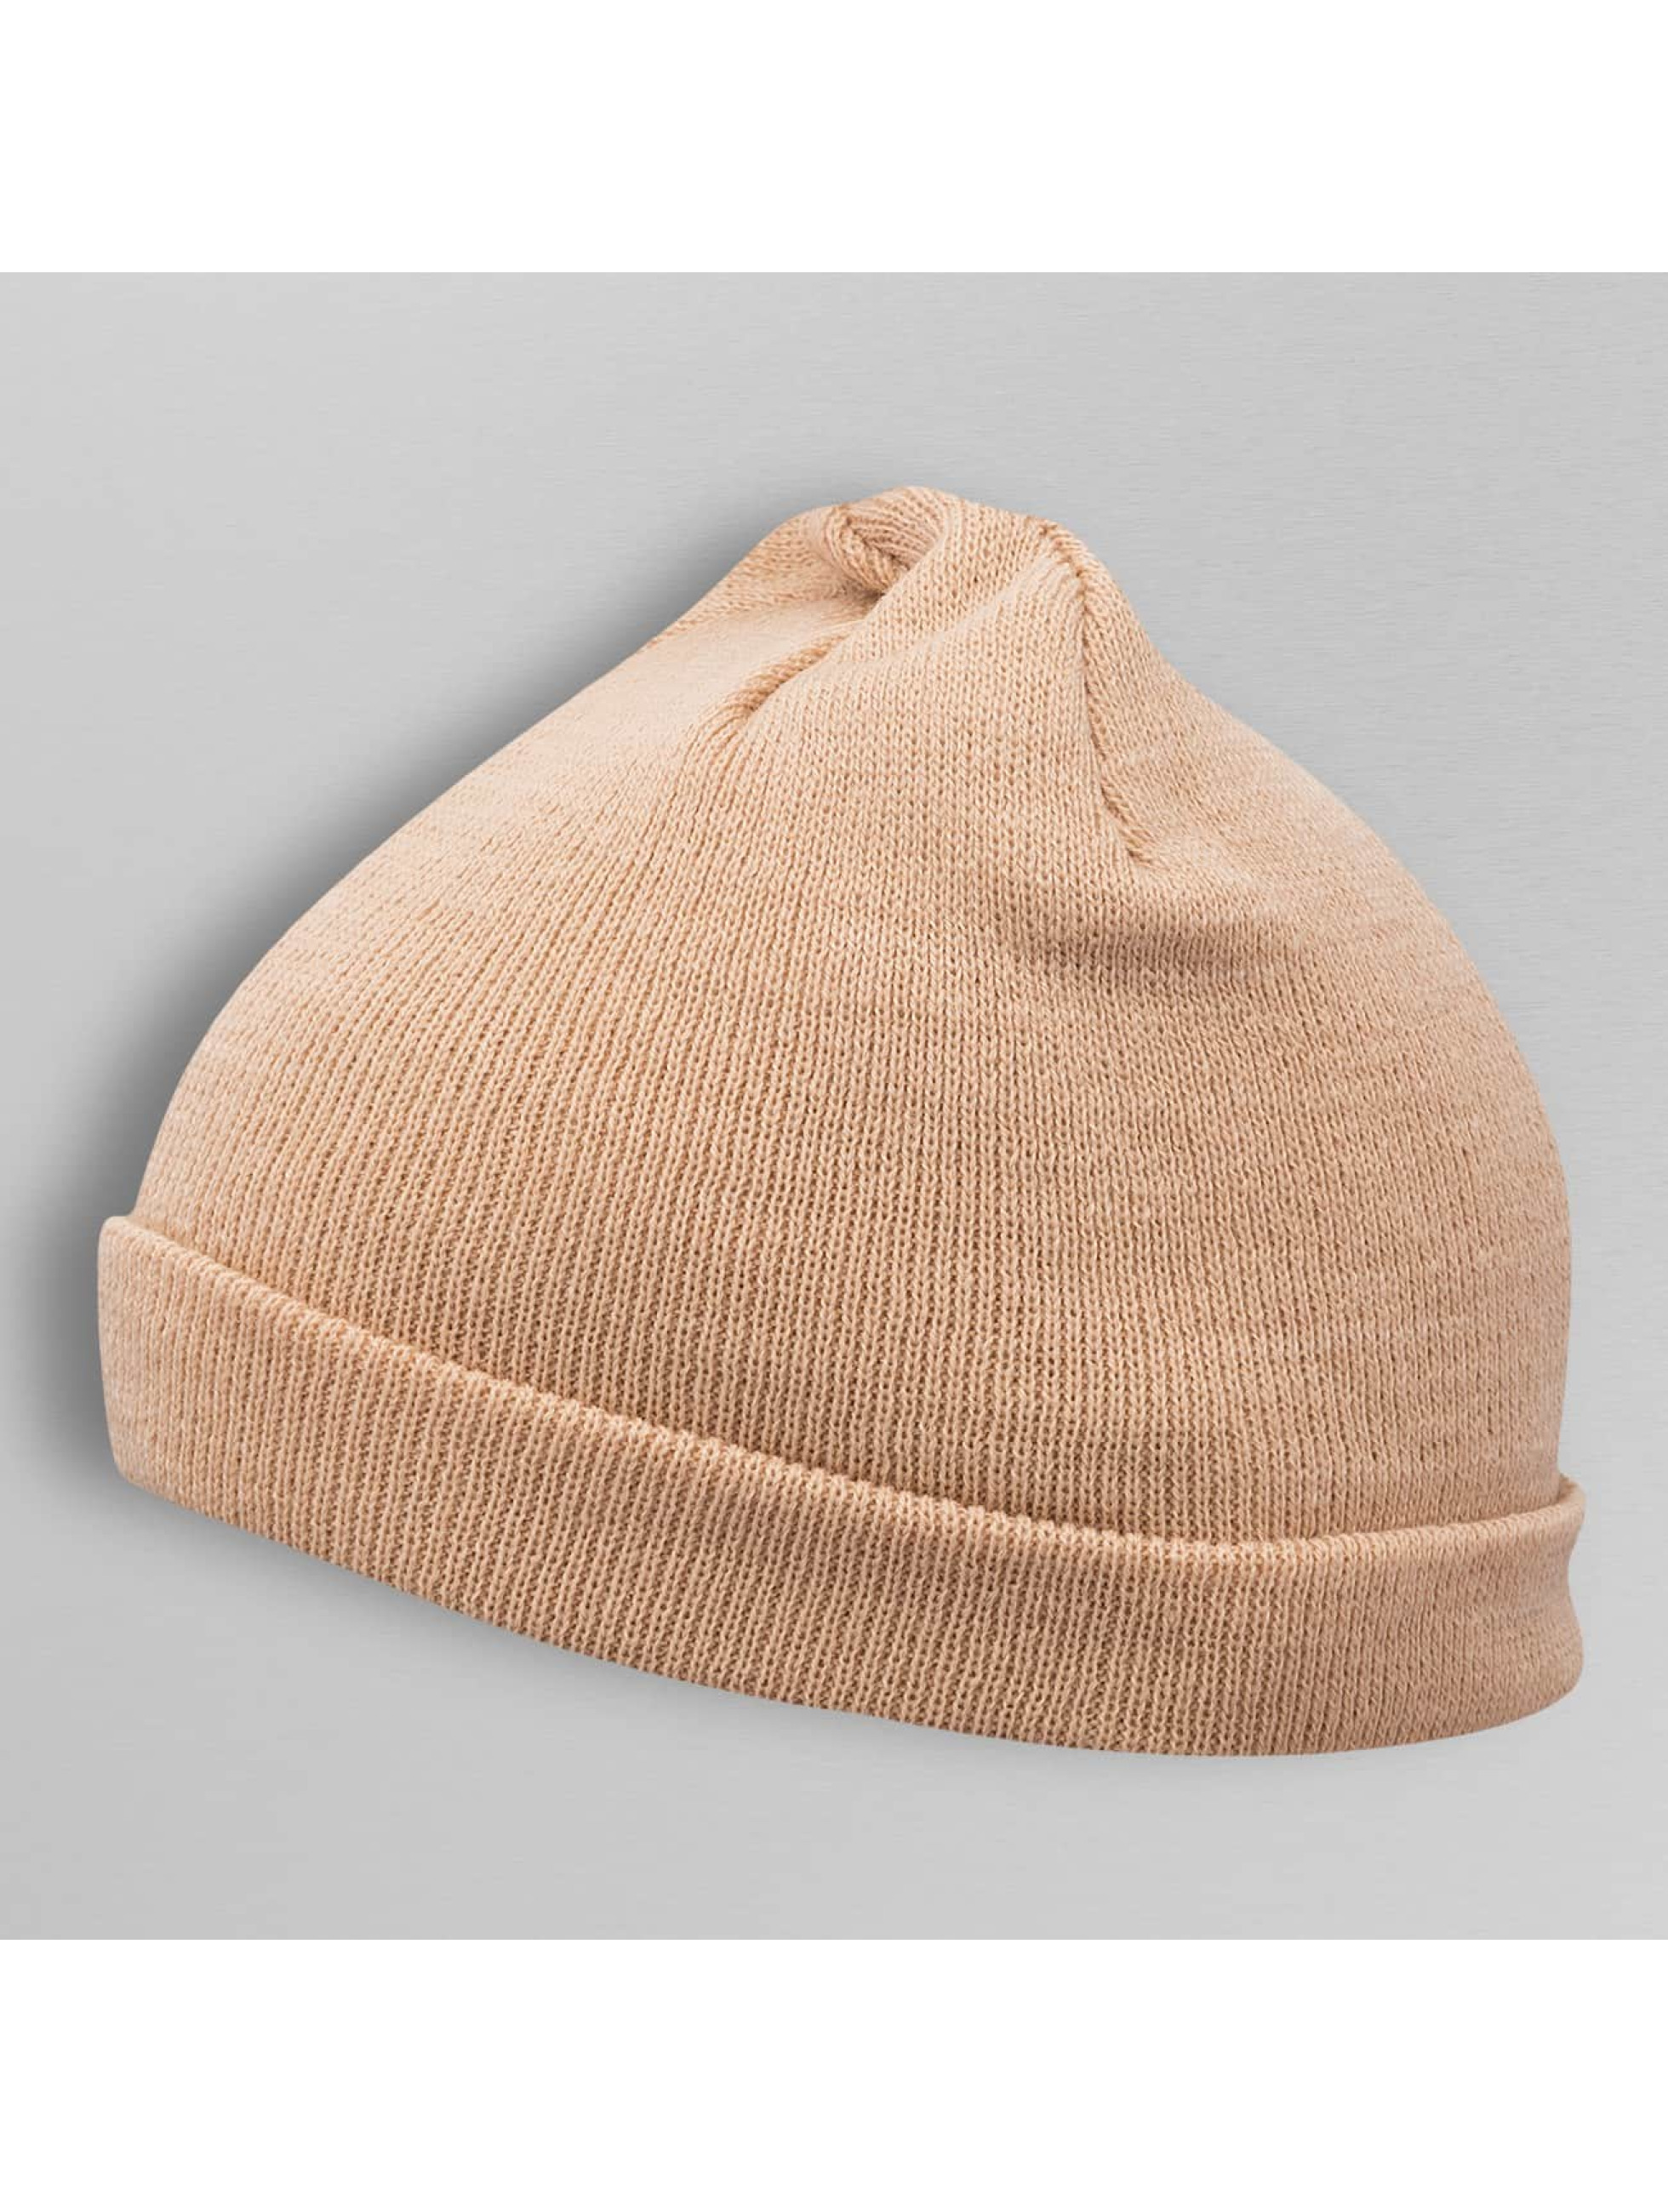 MSTRDS шляпа Short Pastel Cuff Knit бежевый